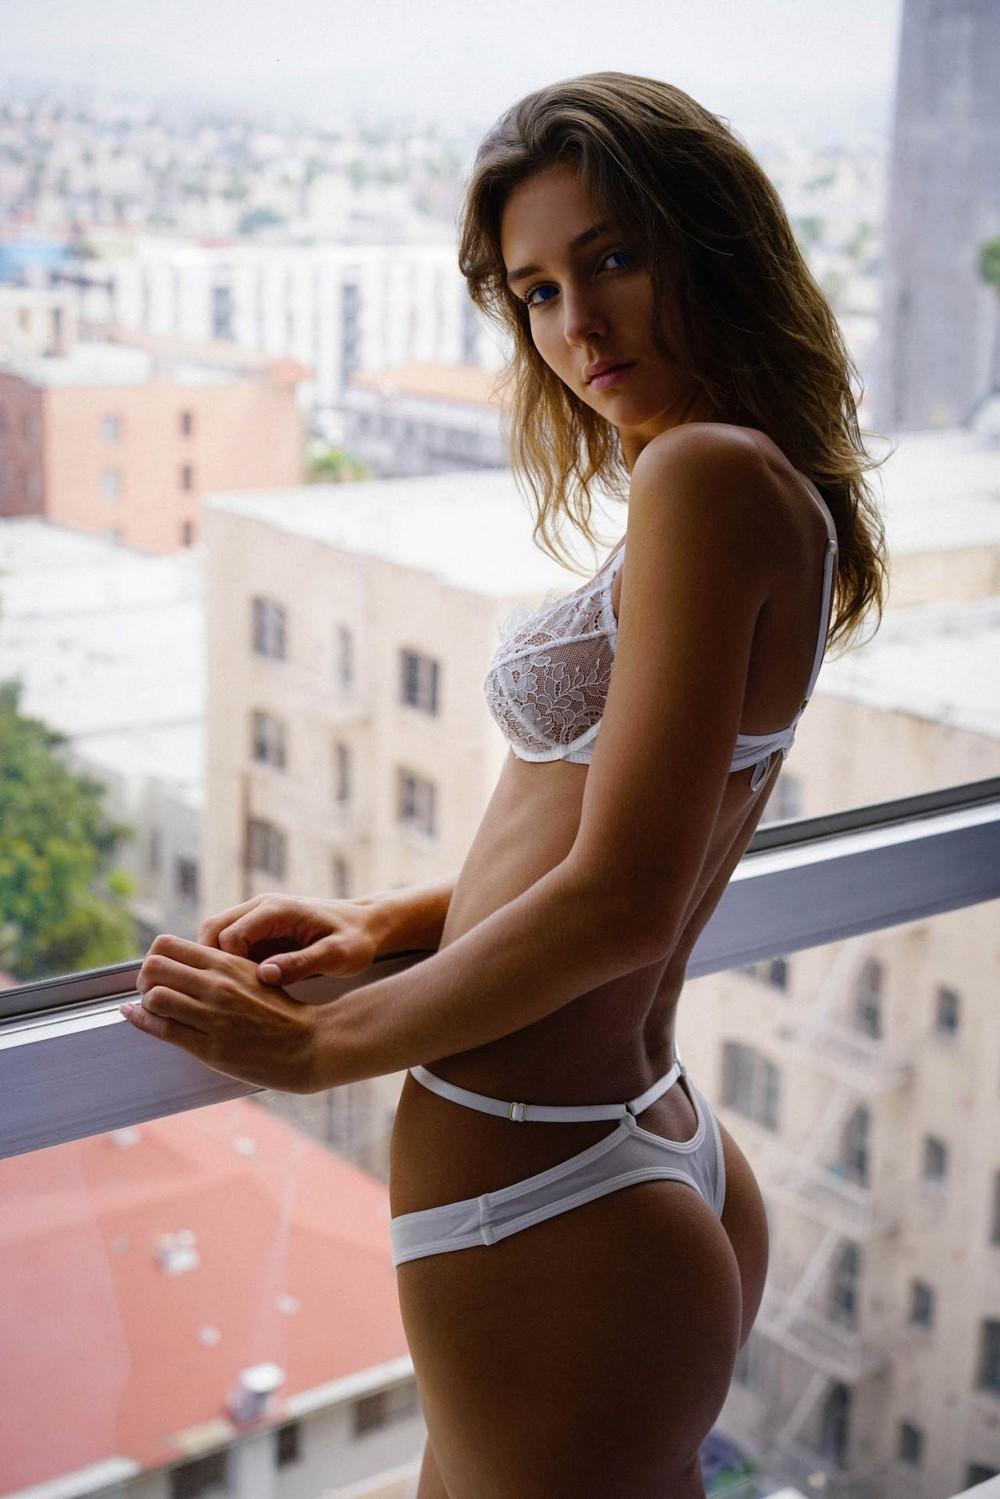 taboo-imgur-naked-girls-women-anal-gapping